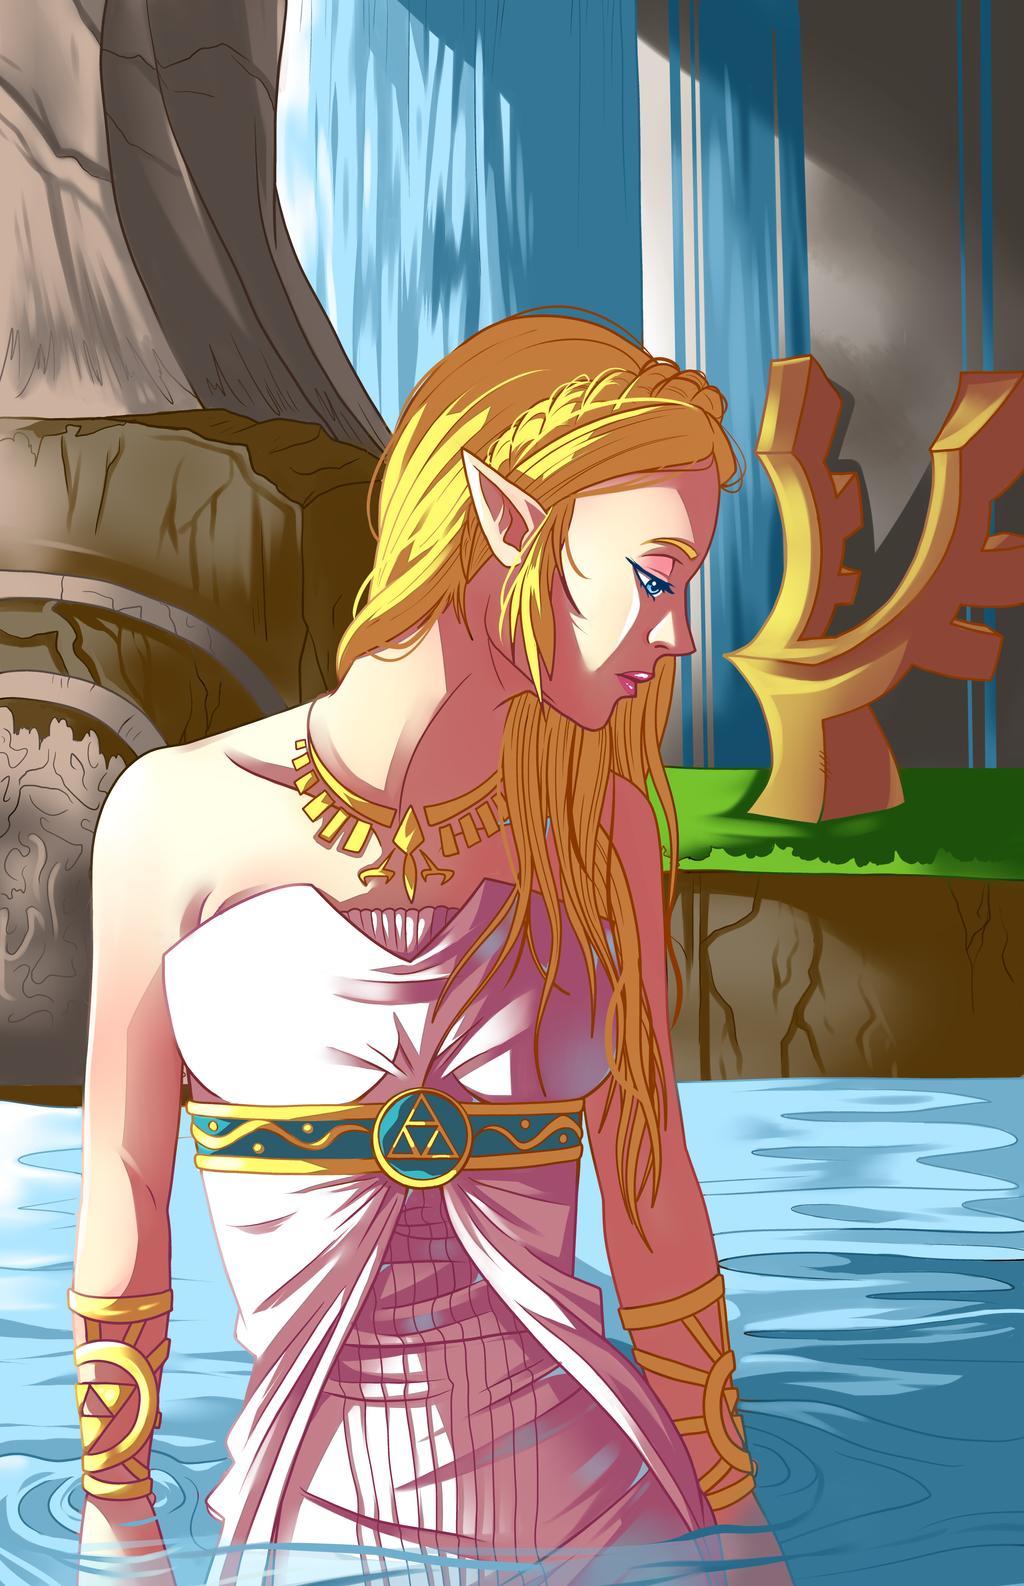 Hylian Goddess Collaboration by RavenMomoka